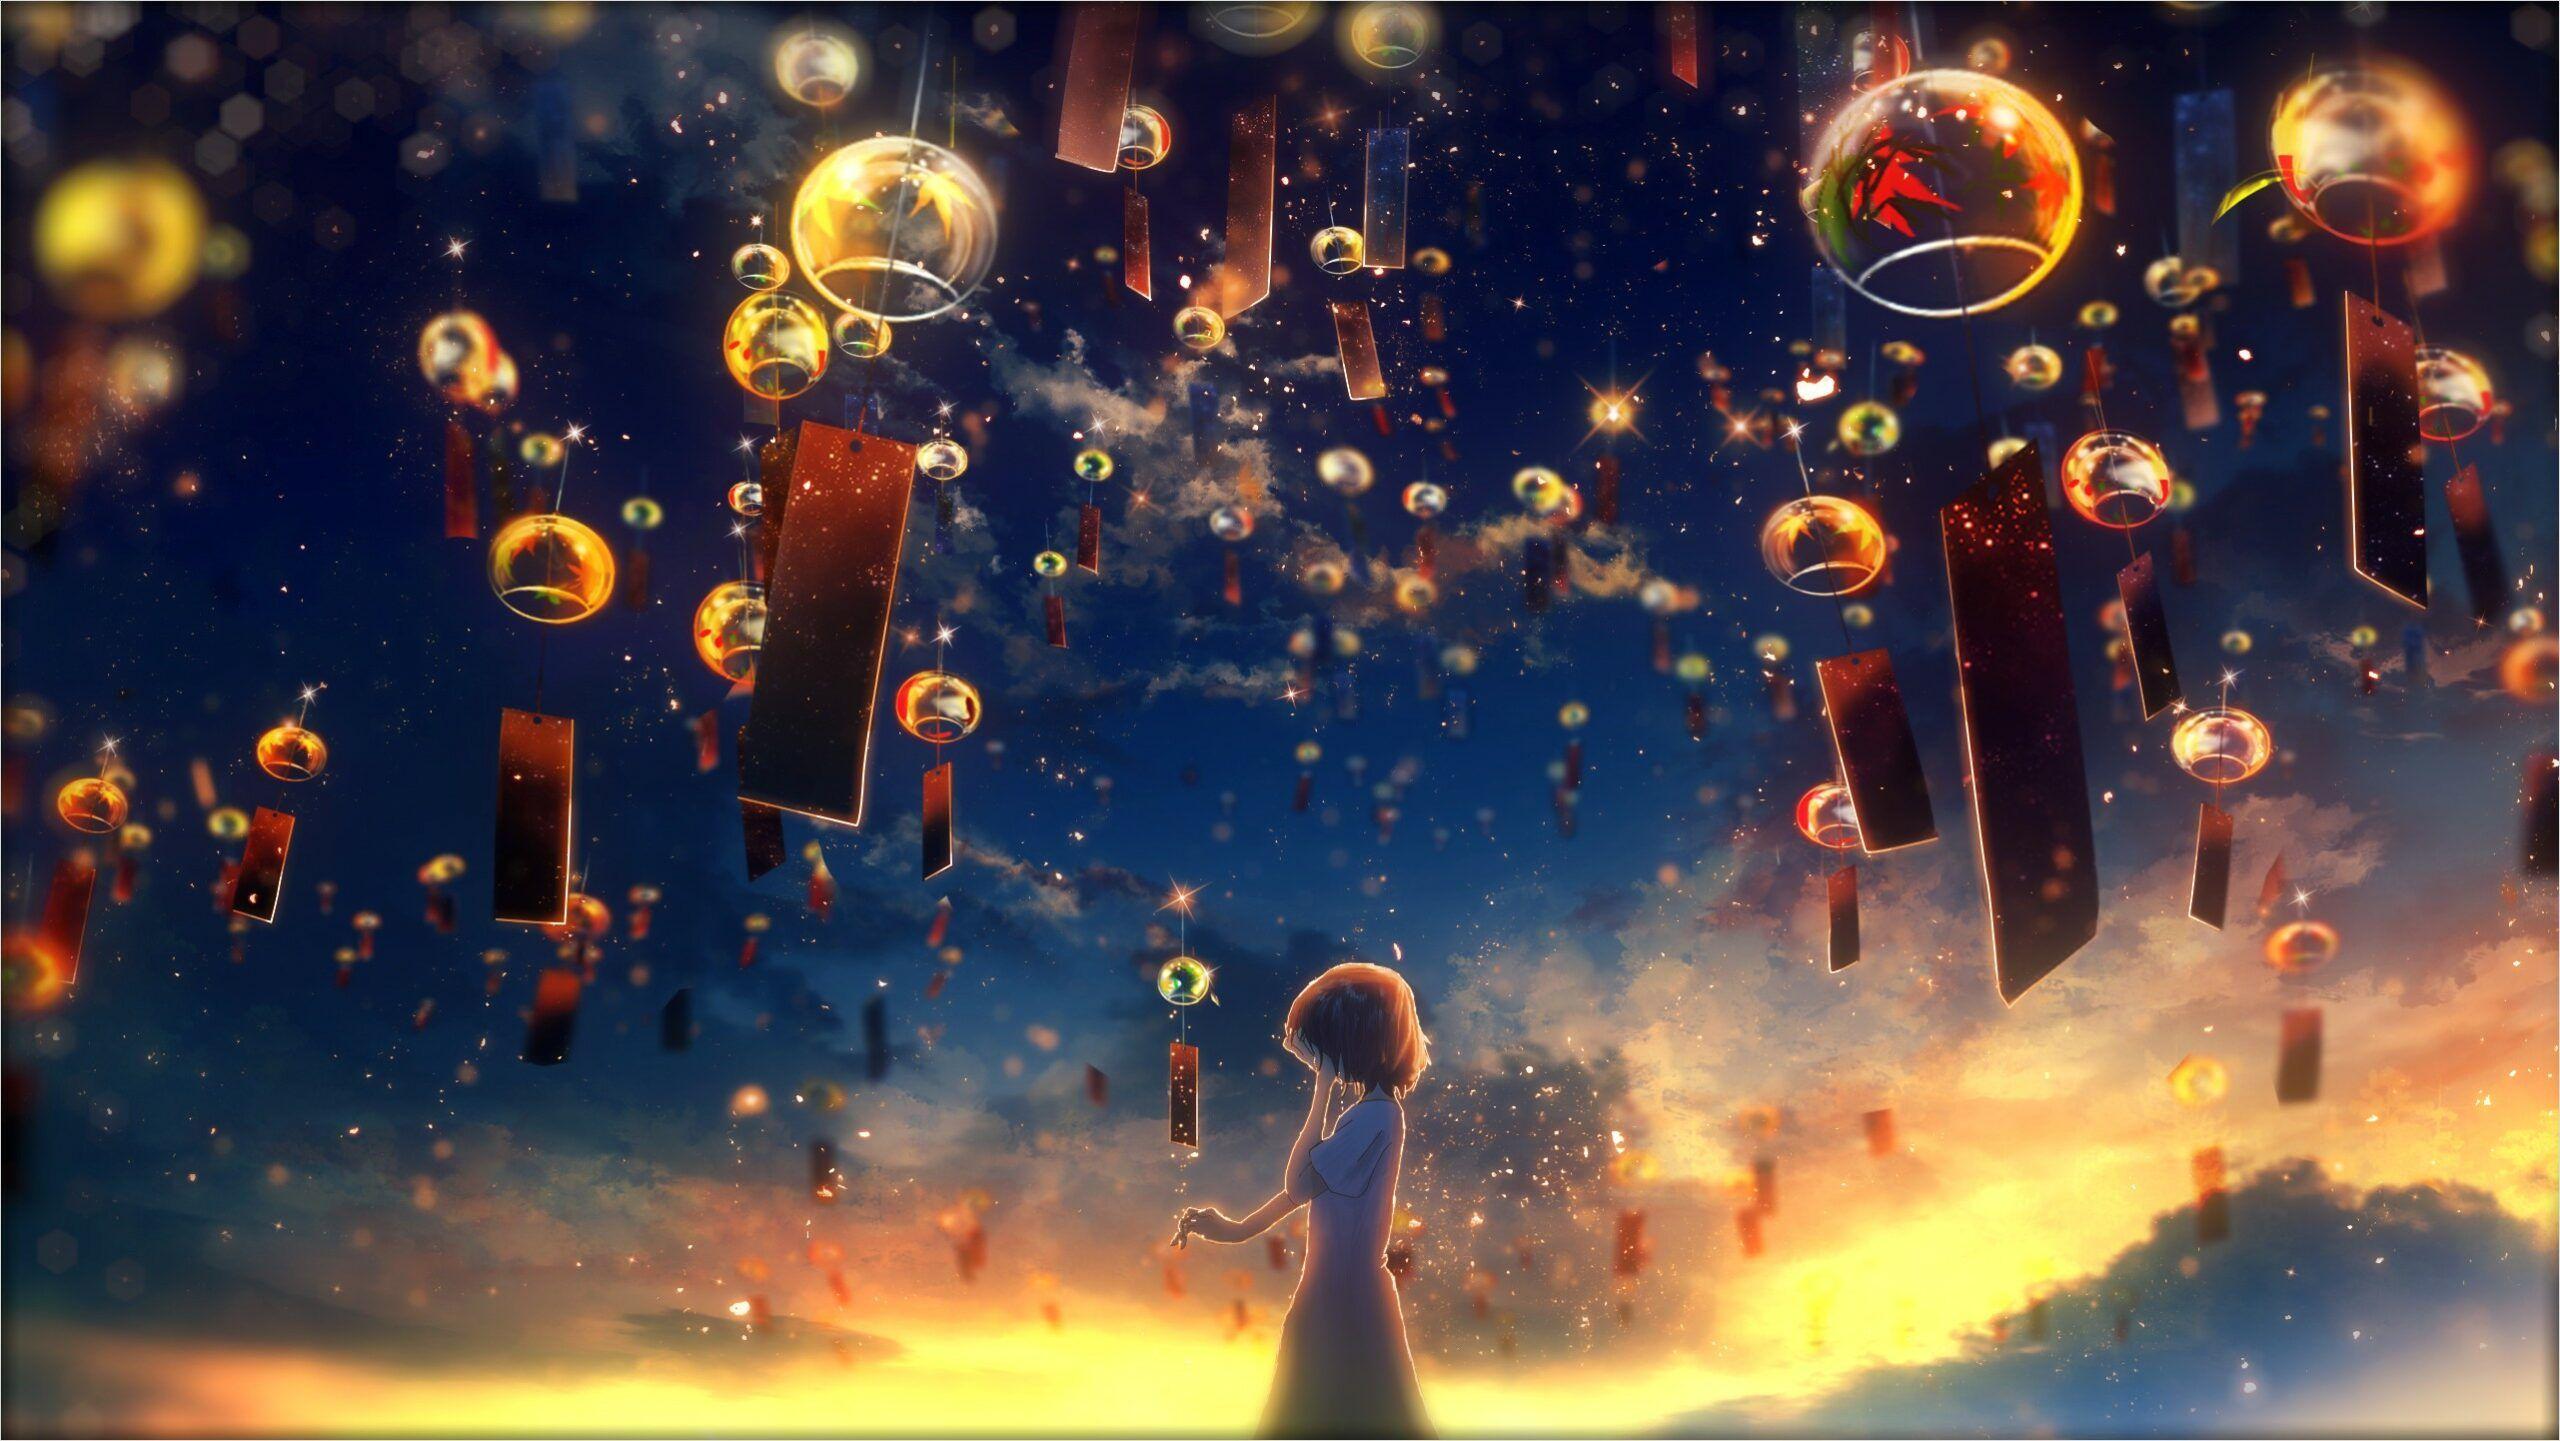 4k Animated Wallpaper Dream In 2020 Hd Anime Wallpapers Sky Anime Anime Wallpaper